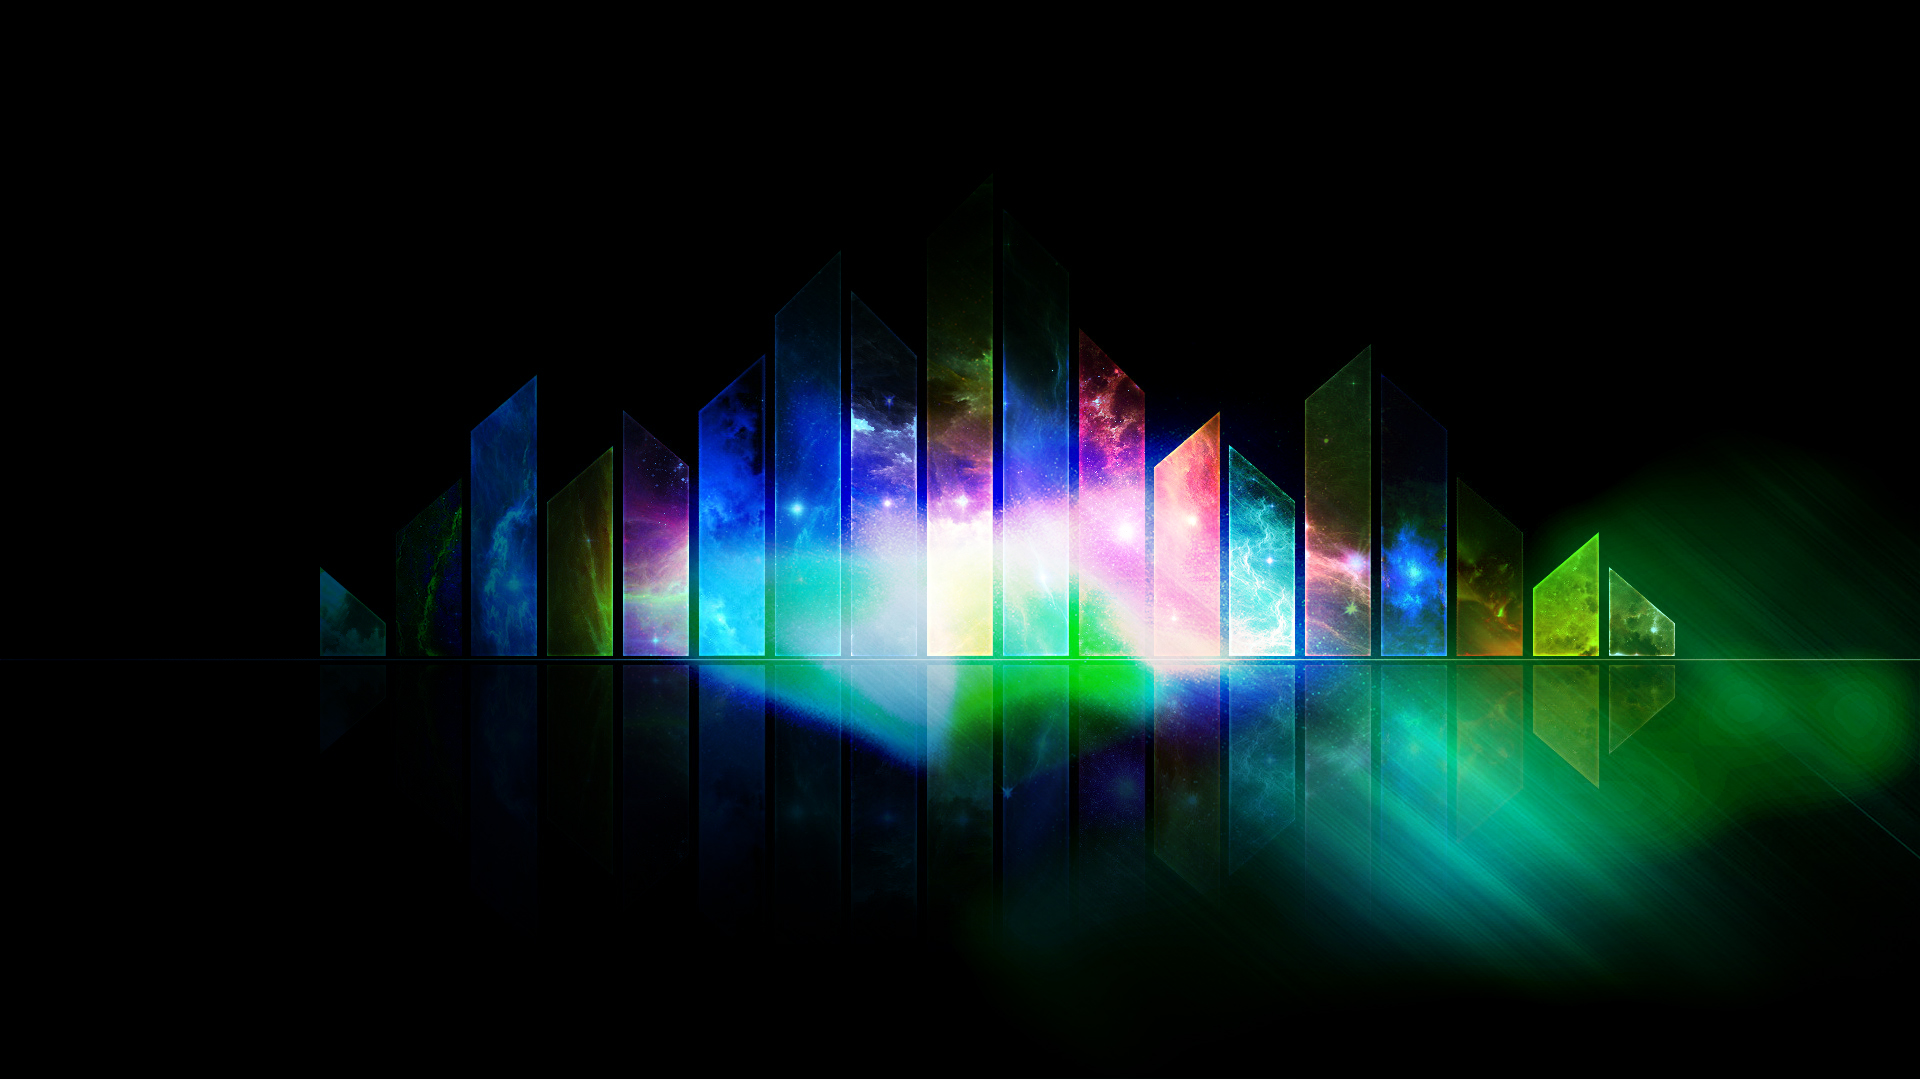 abstract dubstep wallpaper 1080p - photo #7